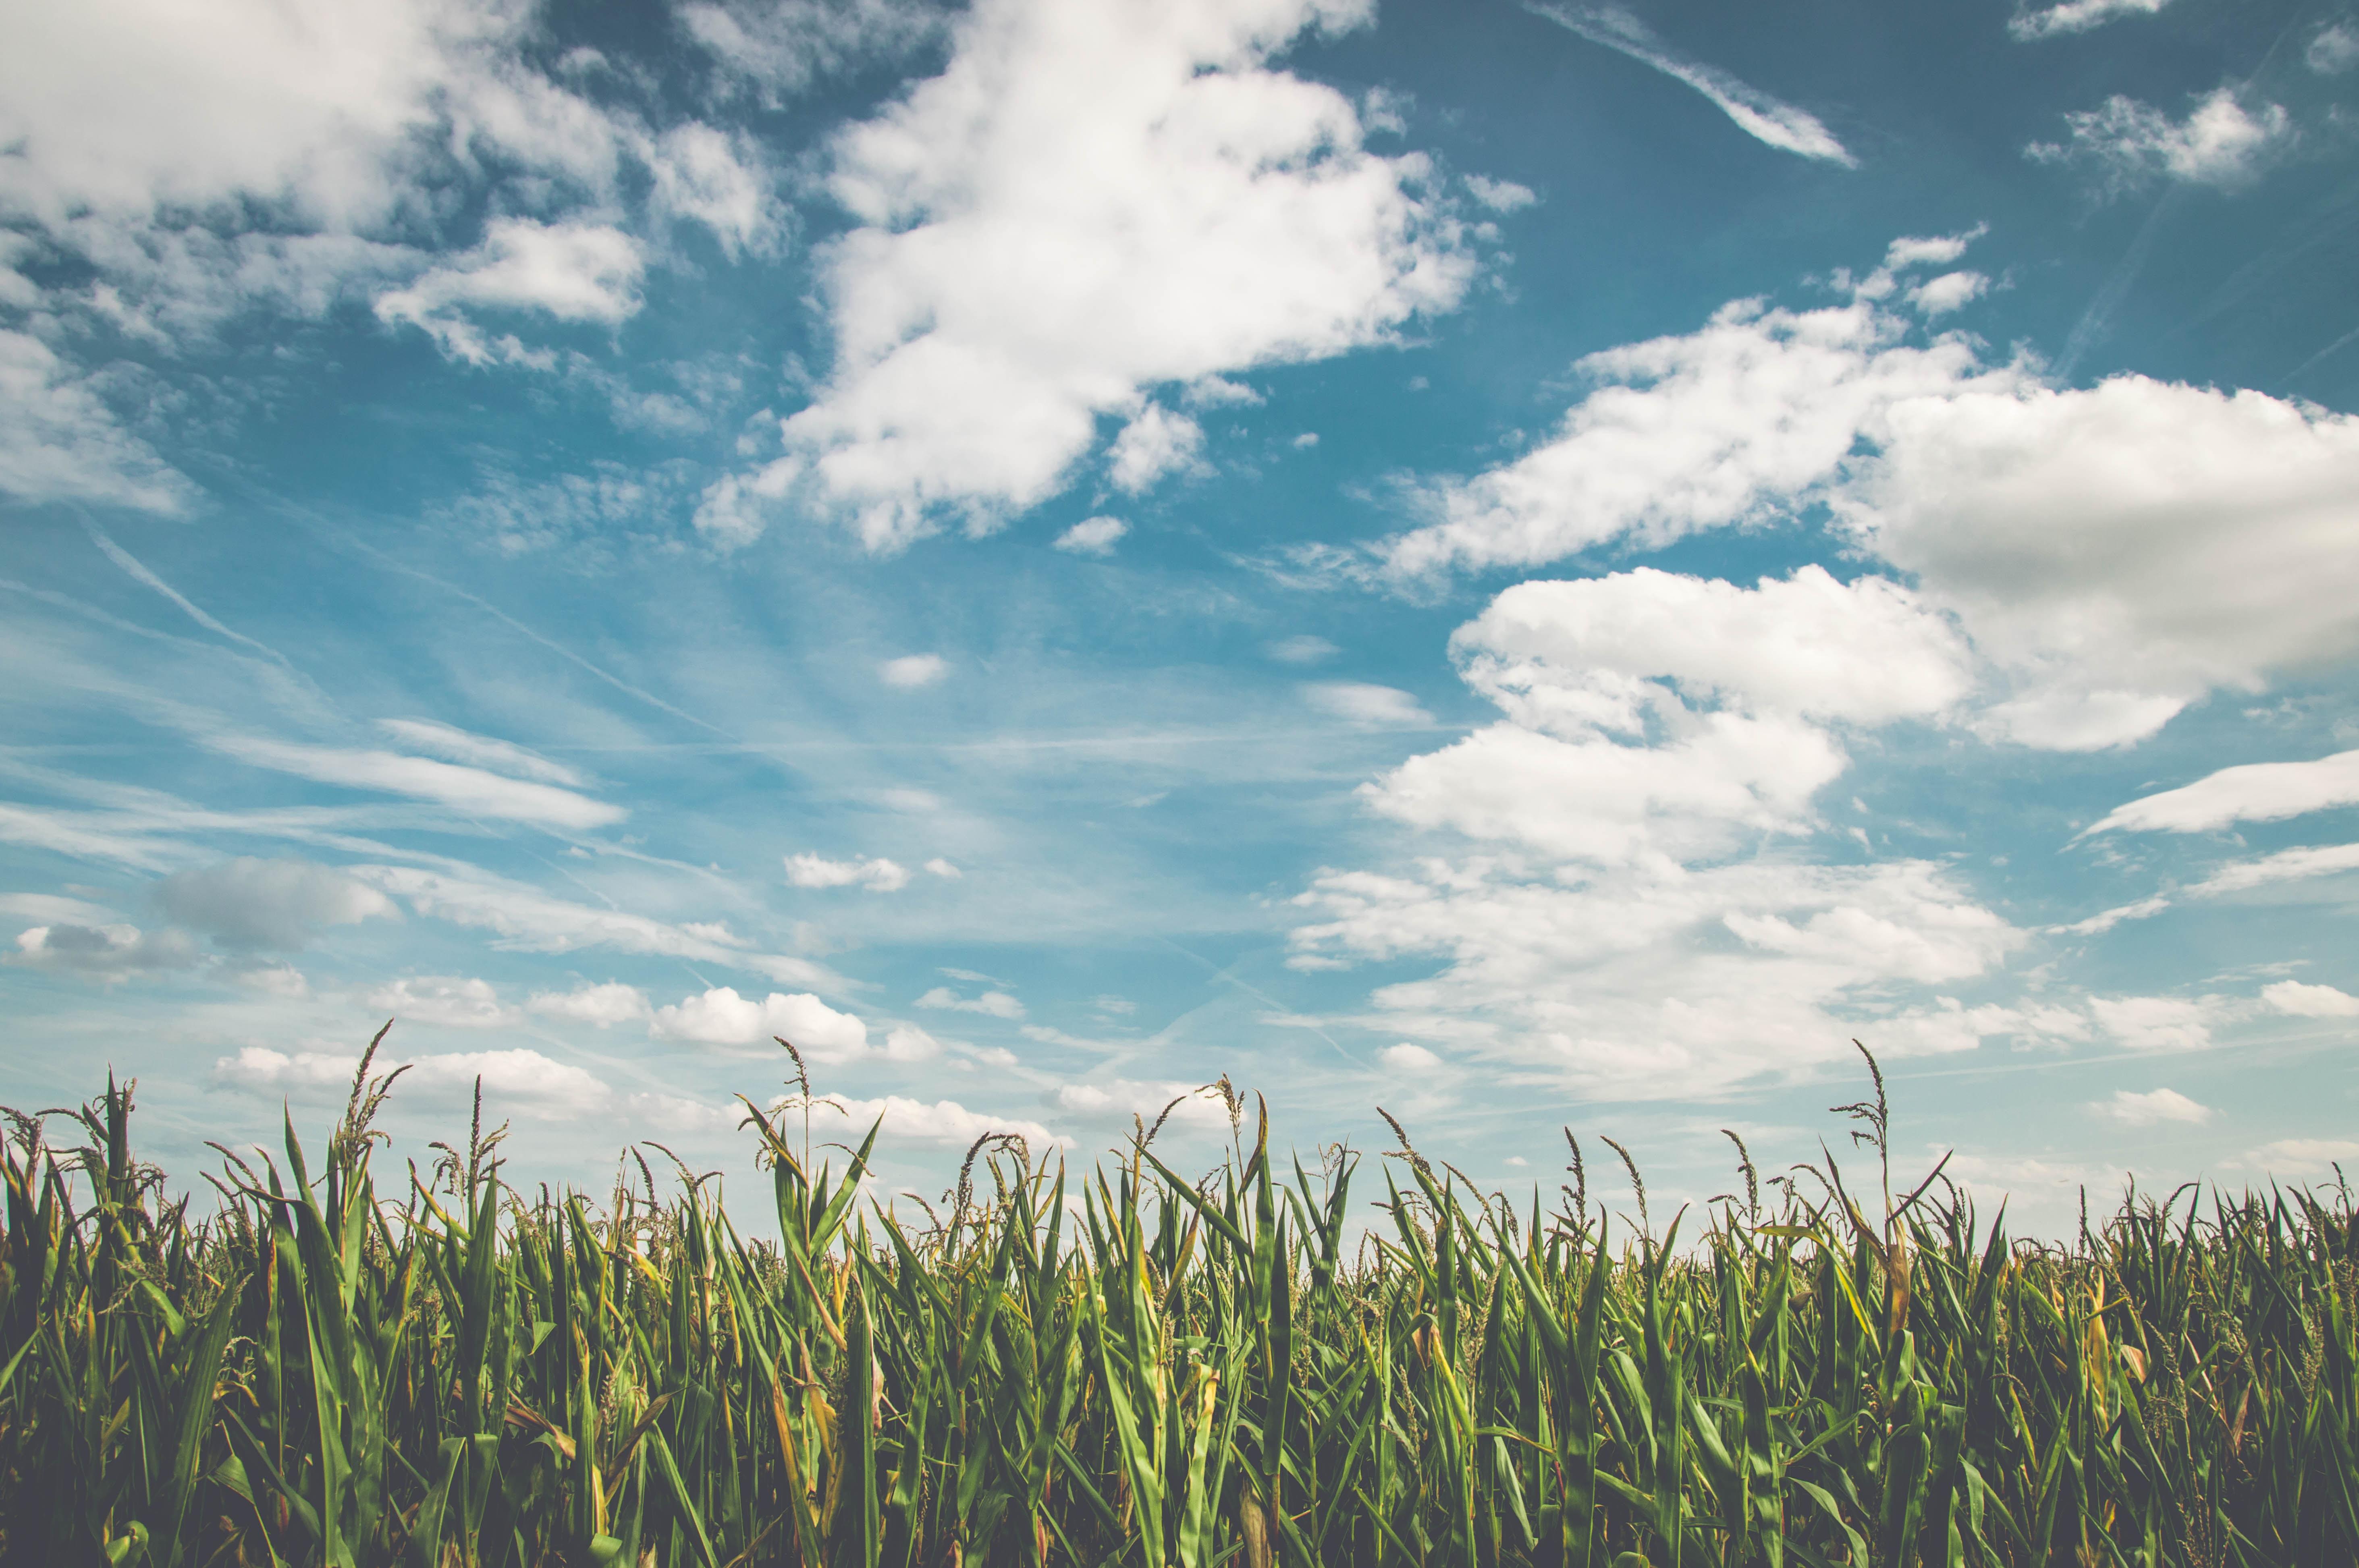 green cornfield under cloudy sky